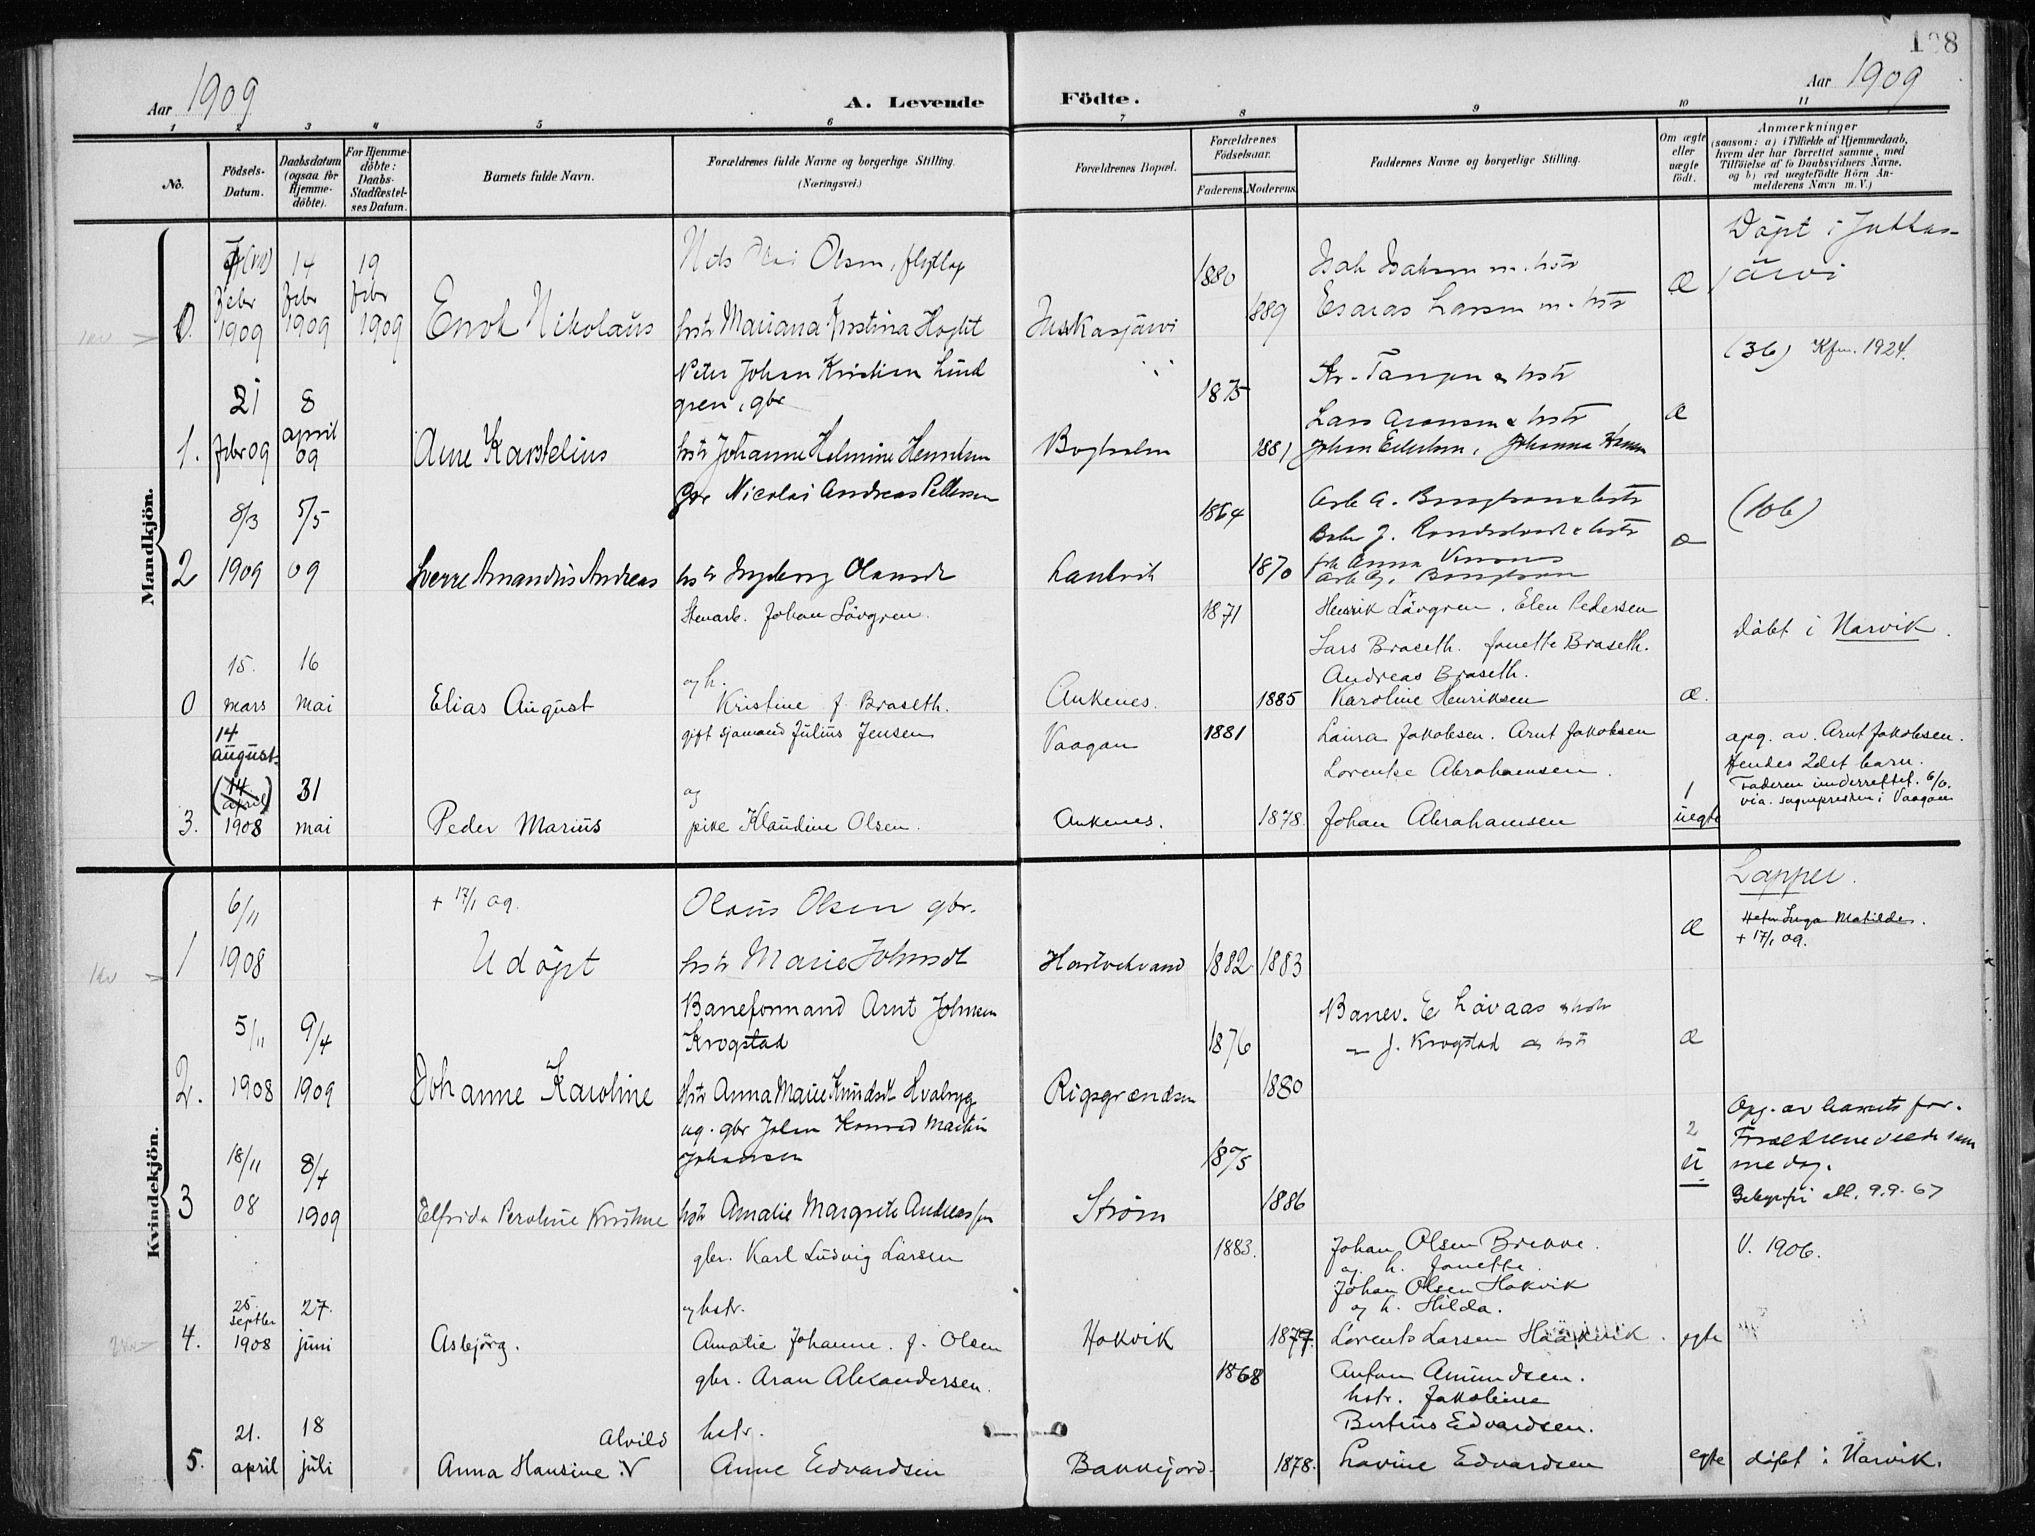 SAT, Ministerialprotokoller, klokkerbøker og fødselsregistre - Nordland, 866/L0941: Ministerialbok nr. 866A04, 1901-1917, s. 108